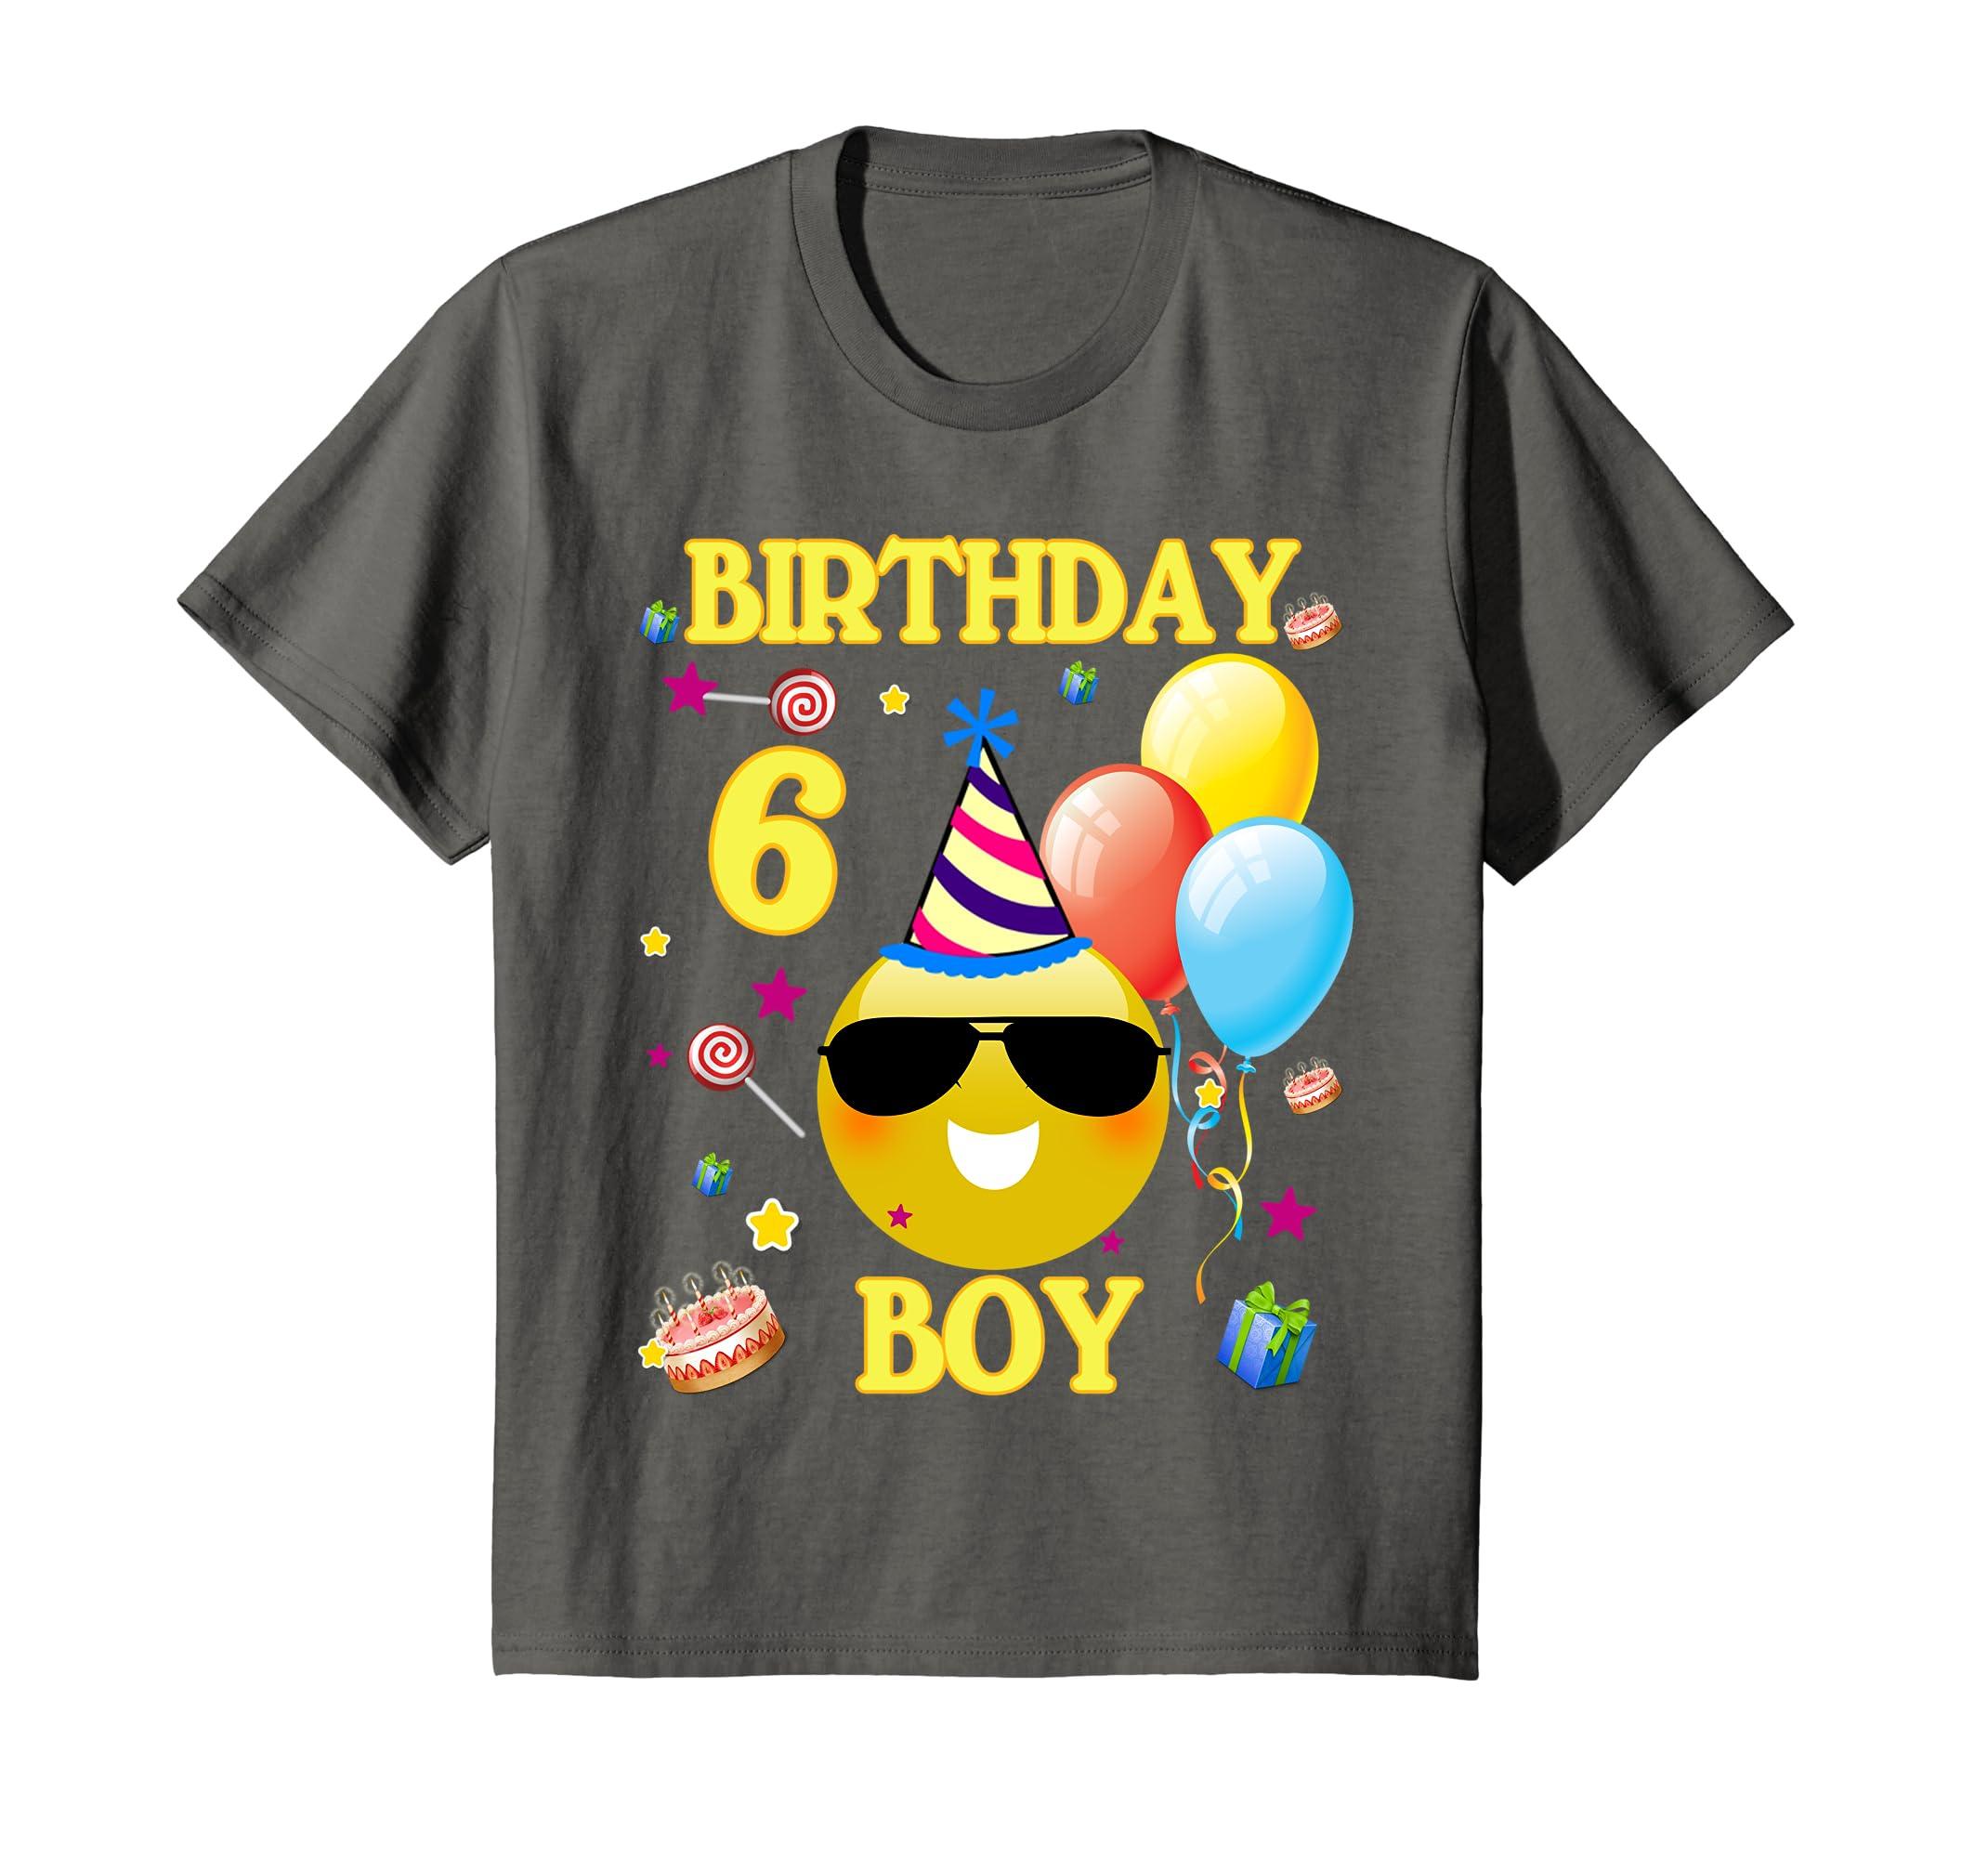 Amazon Kids Cute Emoji 6 Years Old Shirt 6th Birthday Boy Gifts Clothing